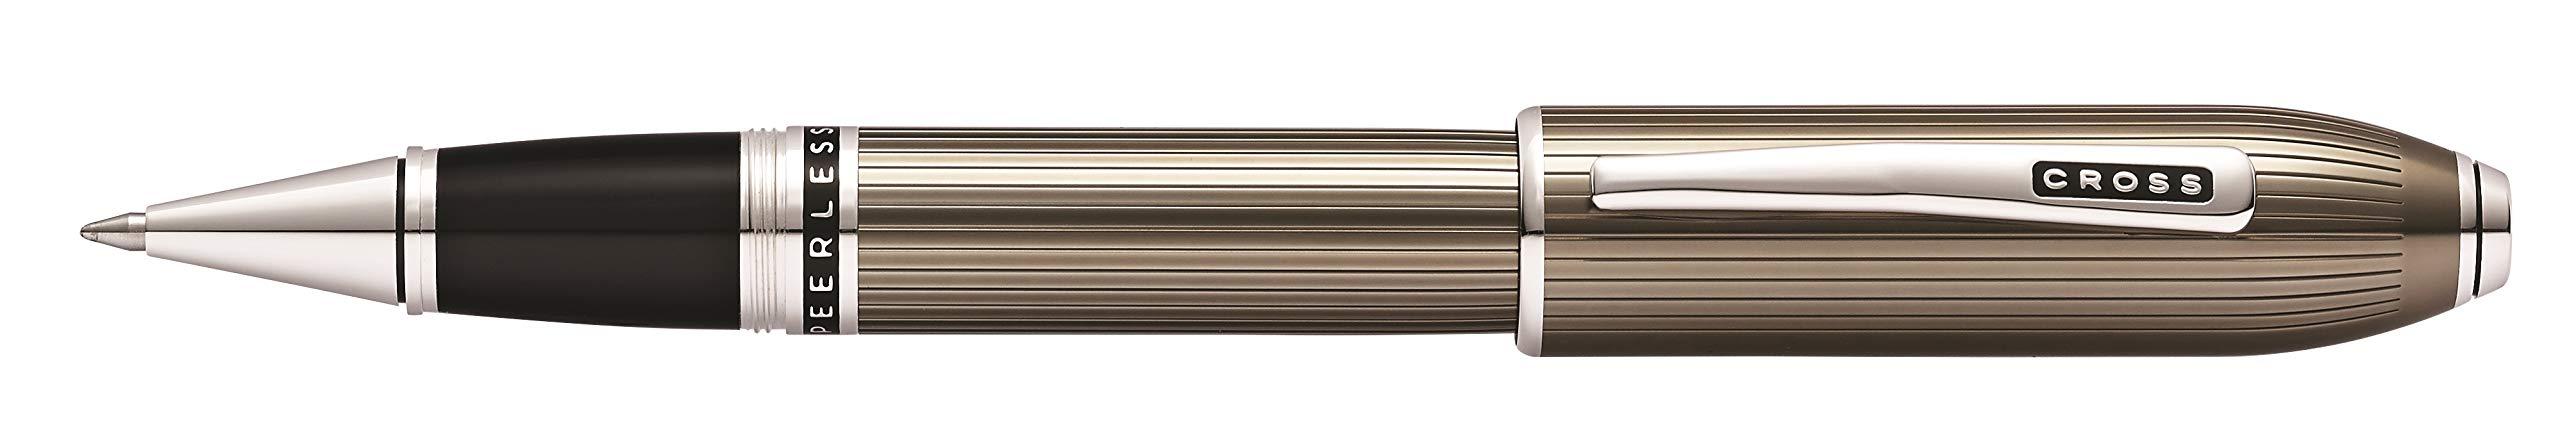 Cross Peerless Translucent Titanium Gray Selectip Rollerball Pen by Cross (Image #1)